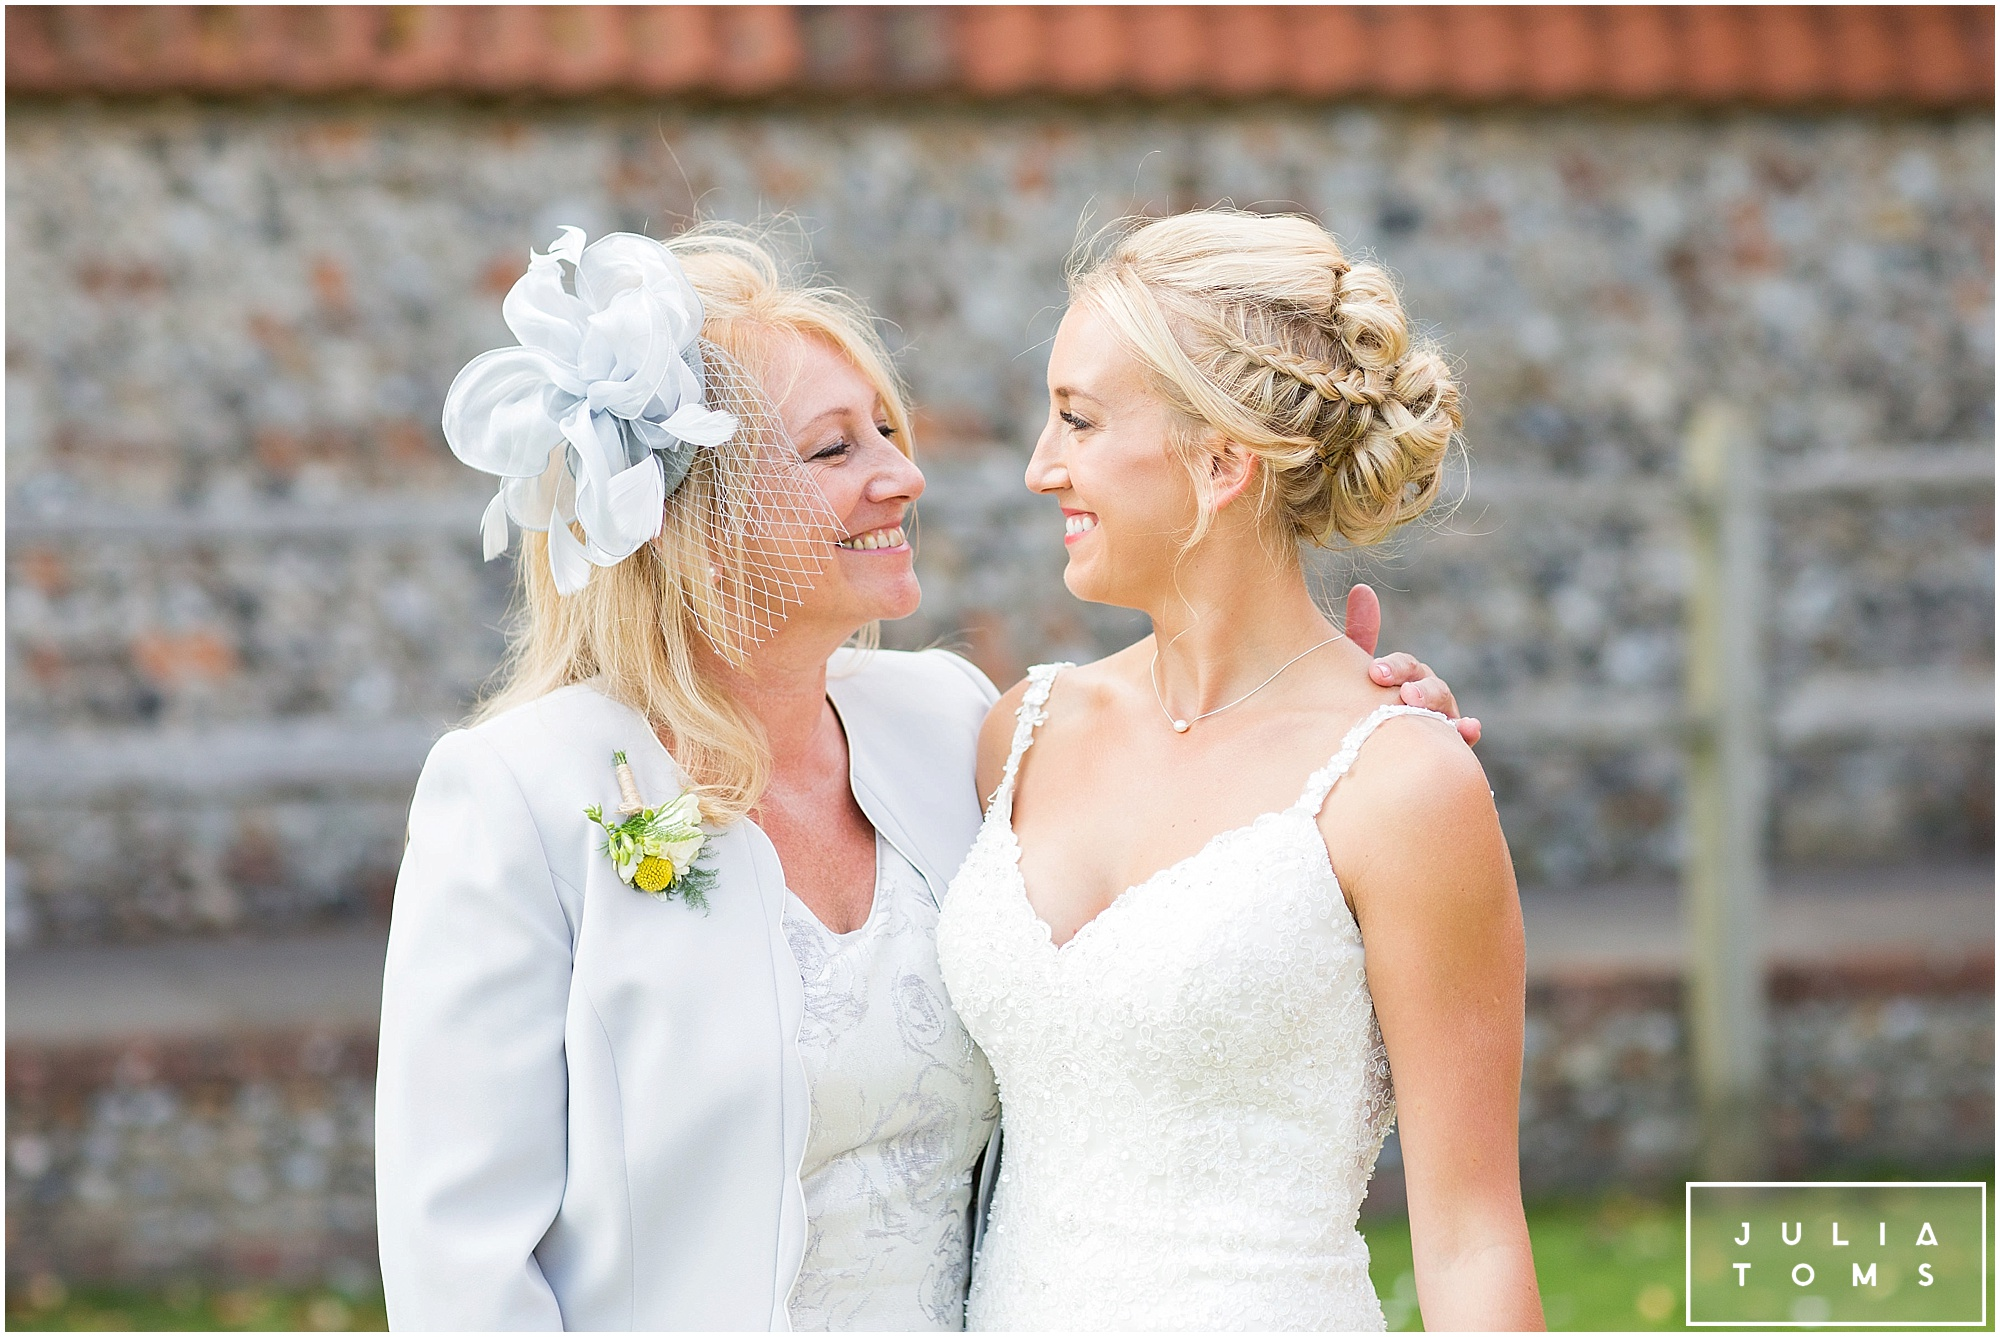 julia_toms_chichester_wedding_photographer_worthing_064.jpg